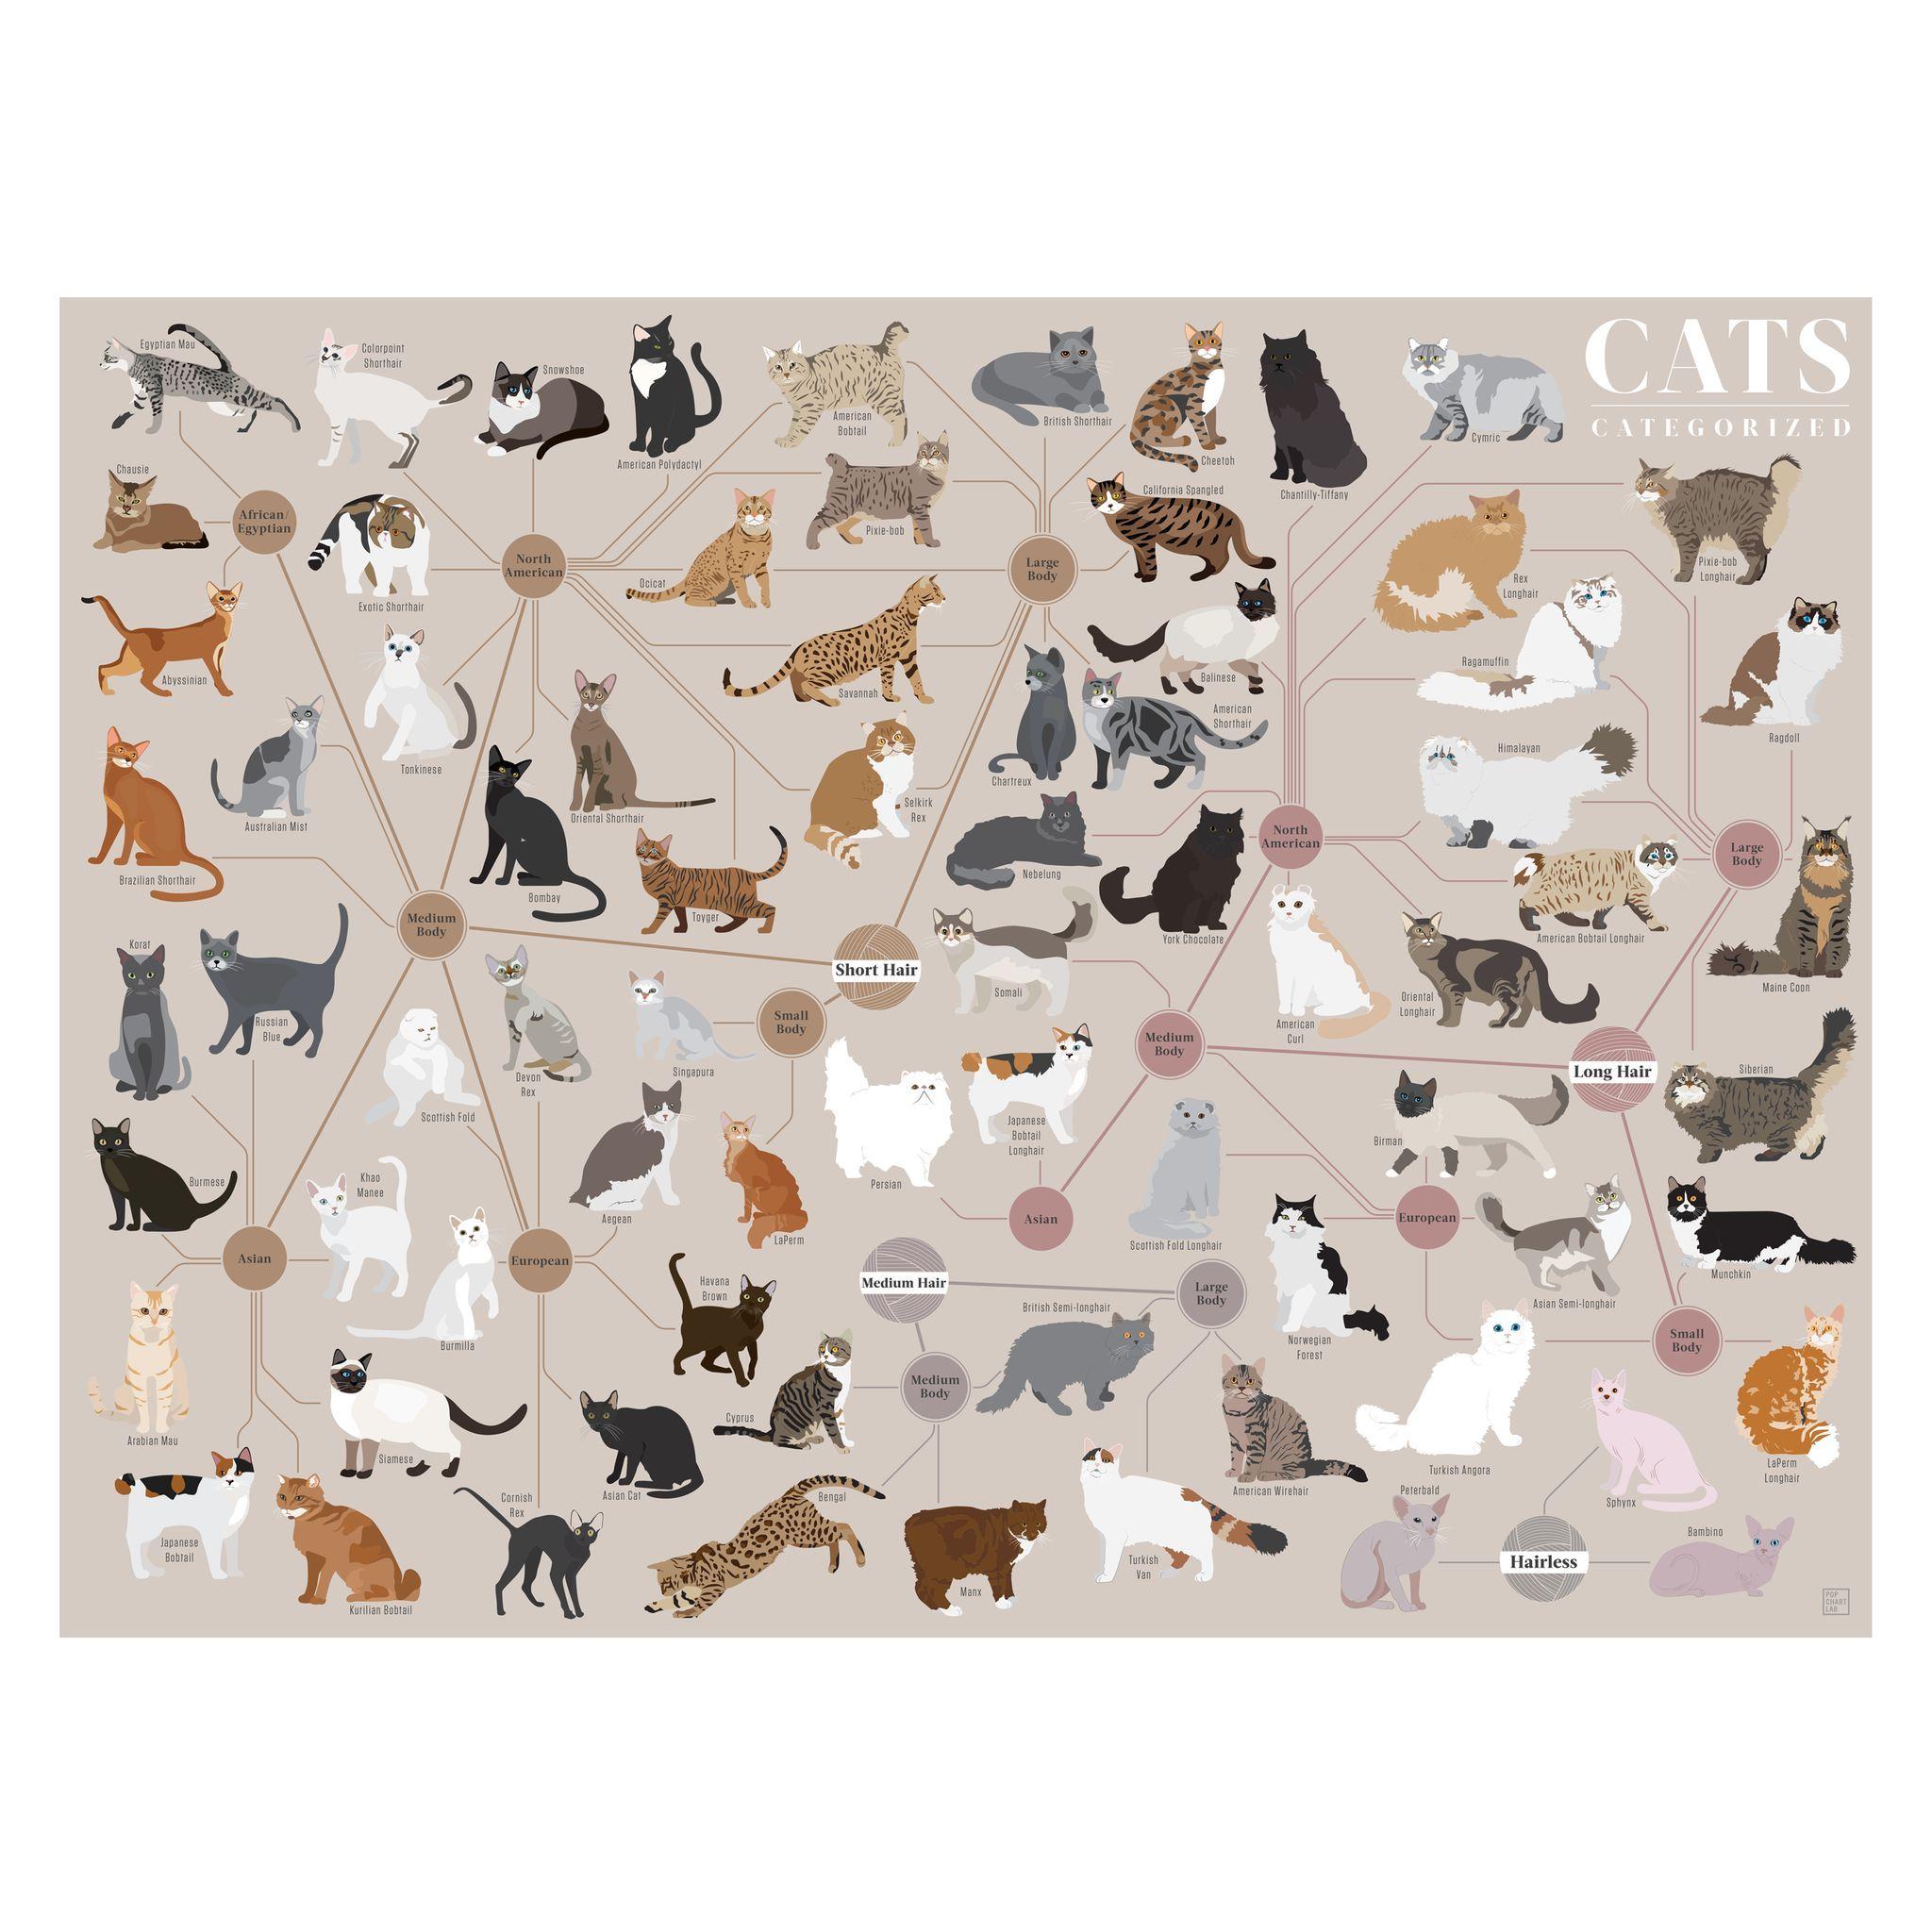 Pin By Amelia Rose On M O D E L D I A G R A M Cat Breeds Chart Cat Breeds Great Cat